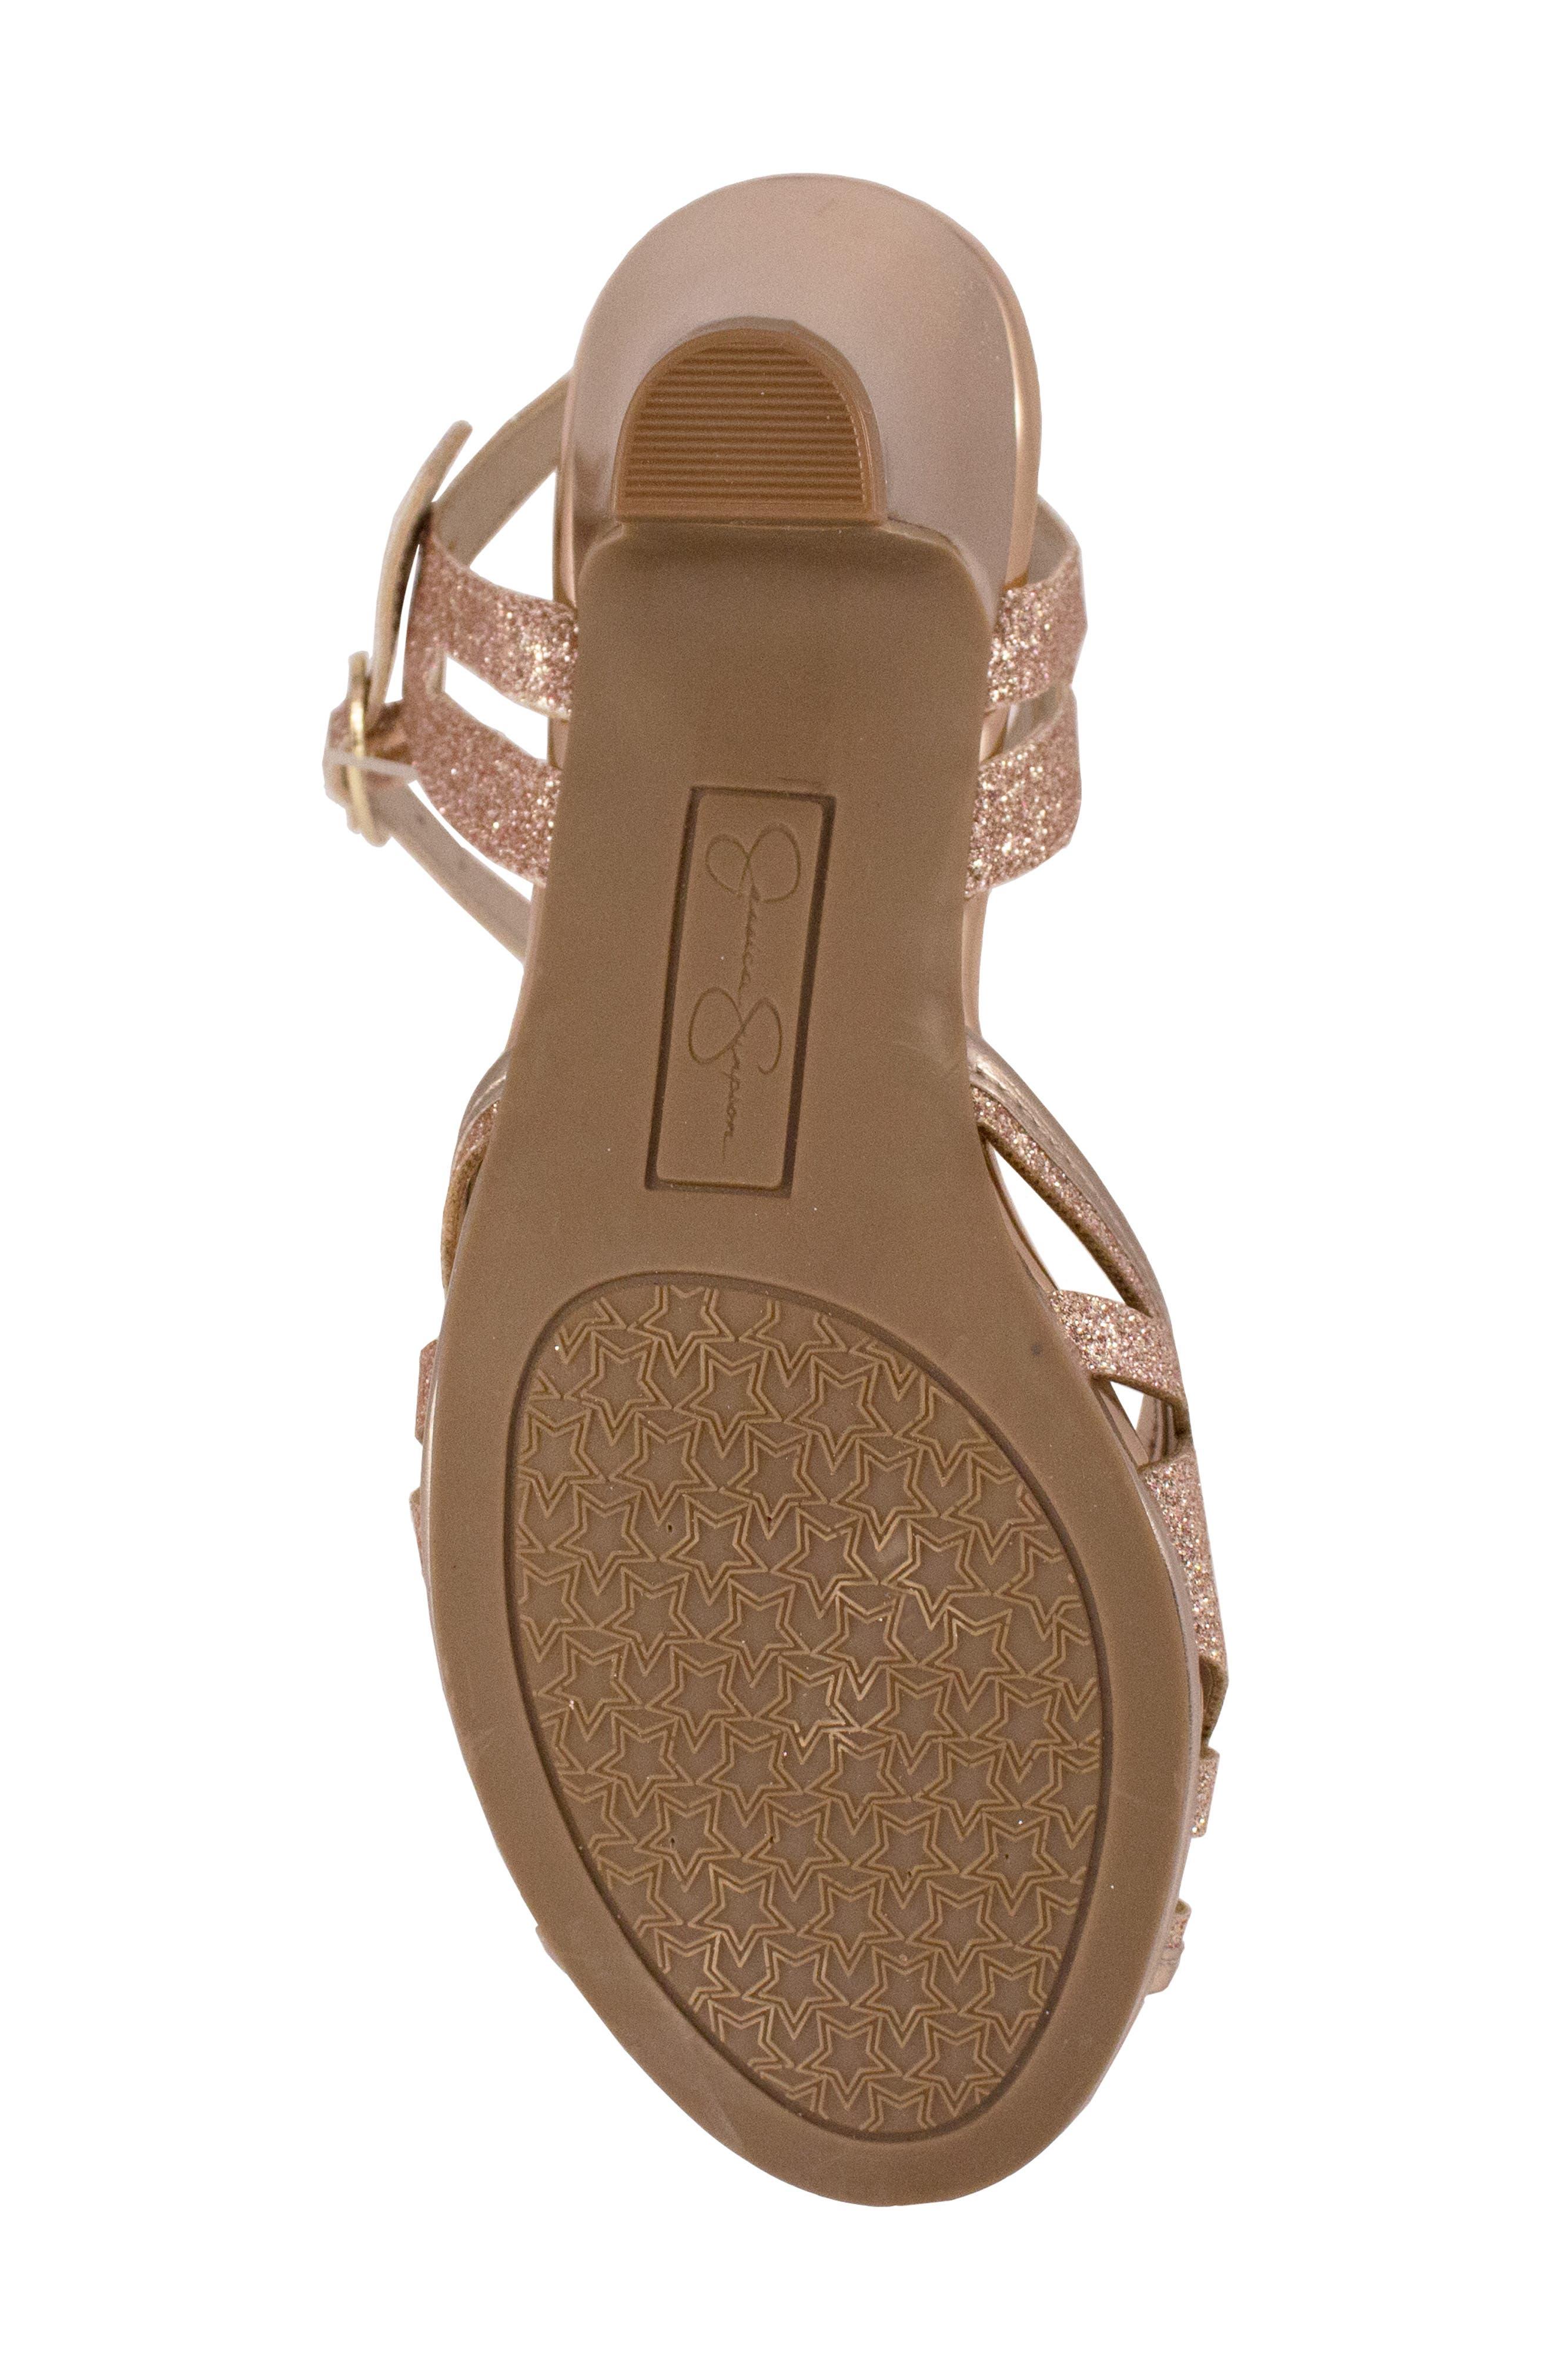 JESSICA SIMPSON,                             Glitter Sandal,                             Alternate thumbnail 6, color,                             ROSE GOLD